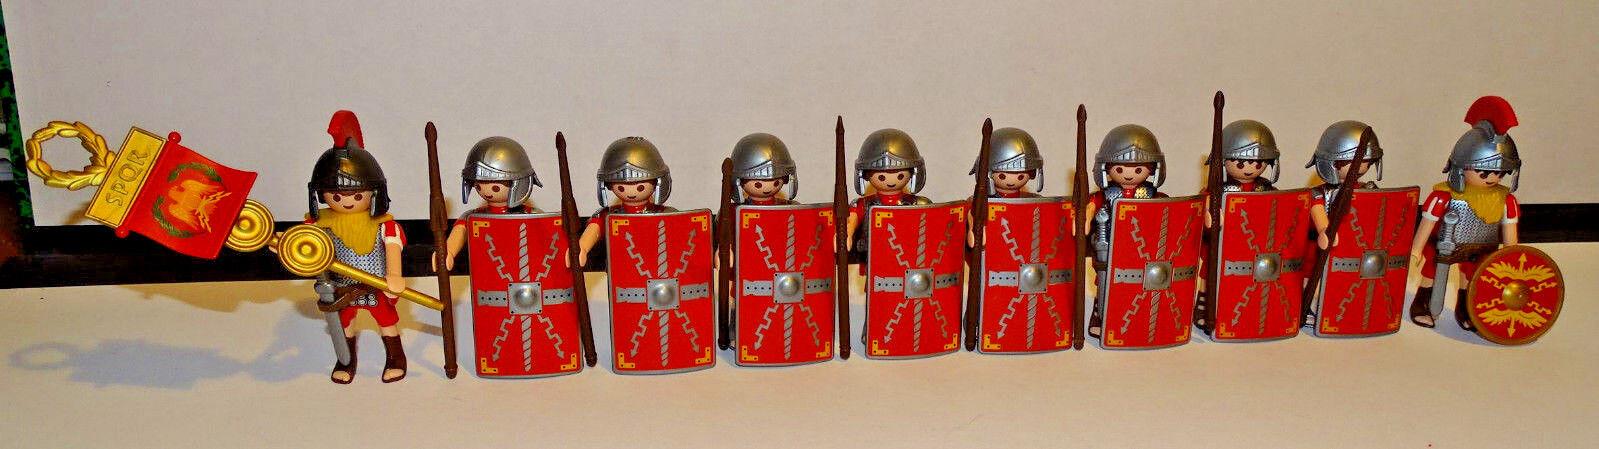 PLAYMOBIL PLAYMOBIL PLAYMOBIL ROMAINS 10 SOLDATS ROMAINS EQUIPES - CENTURION -  ARMES - GLAIVE d14d86